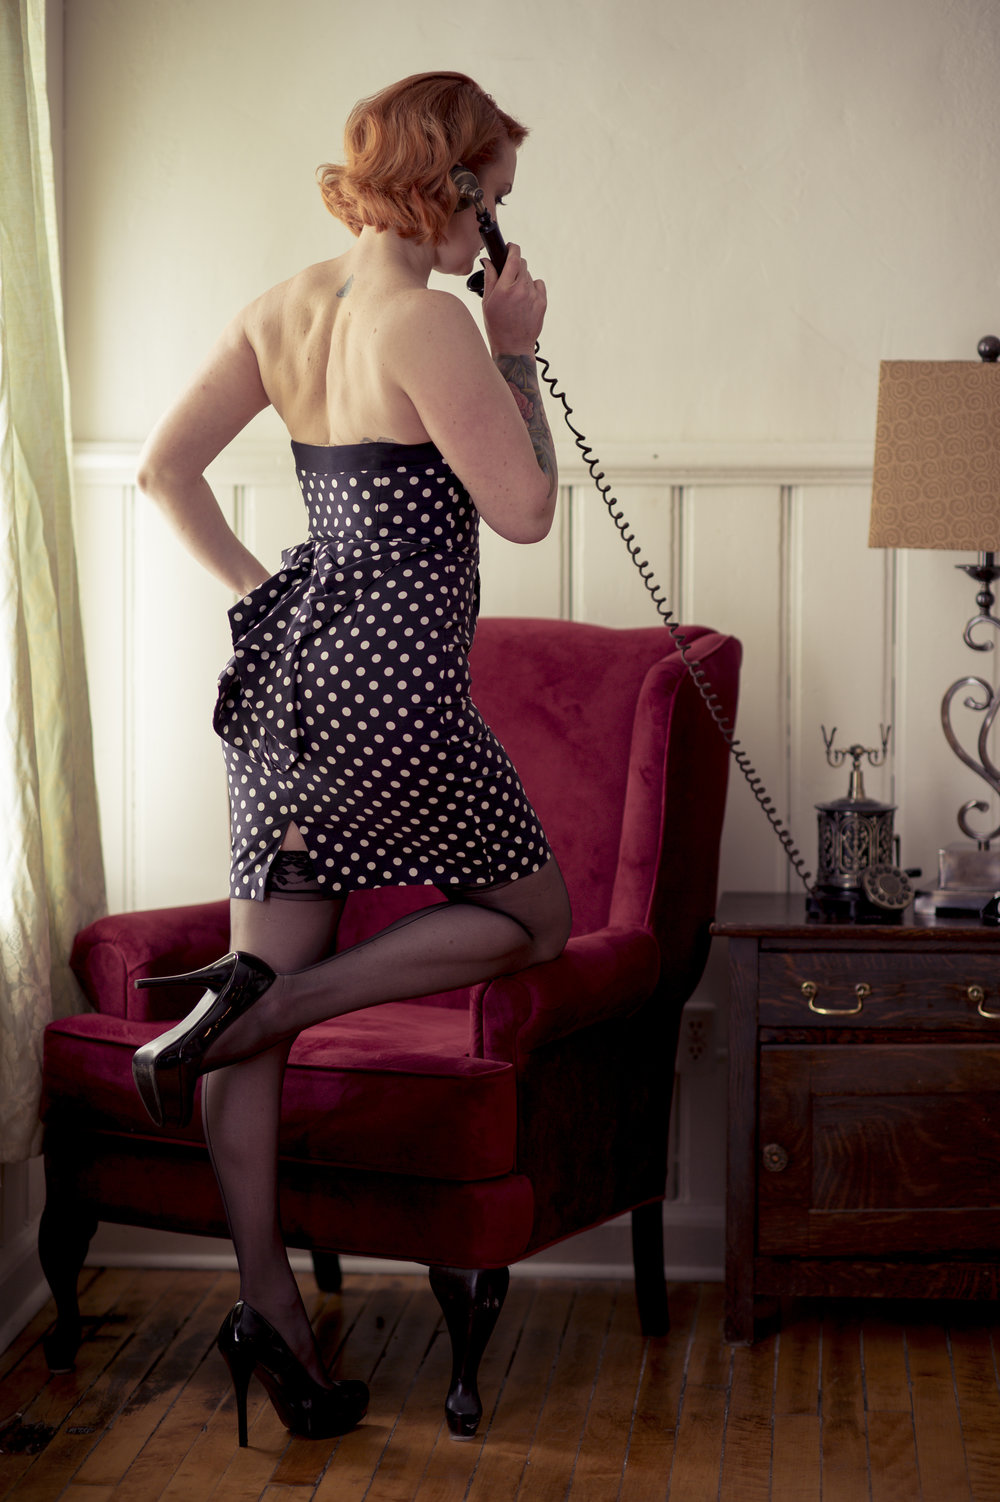 Marta-Hewson-Kim-Murkovich-boudoir-pin-up-style.jpg